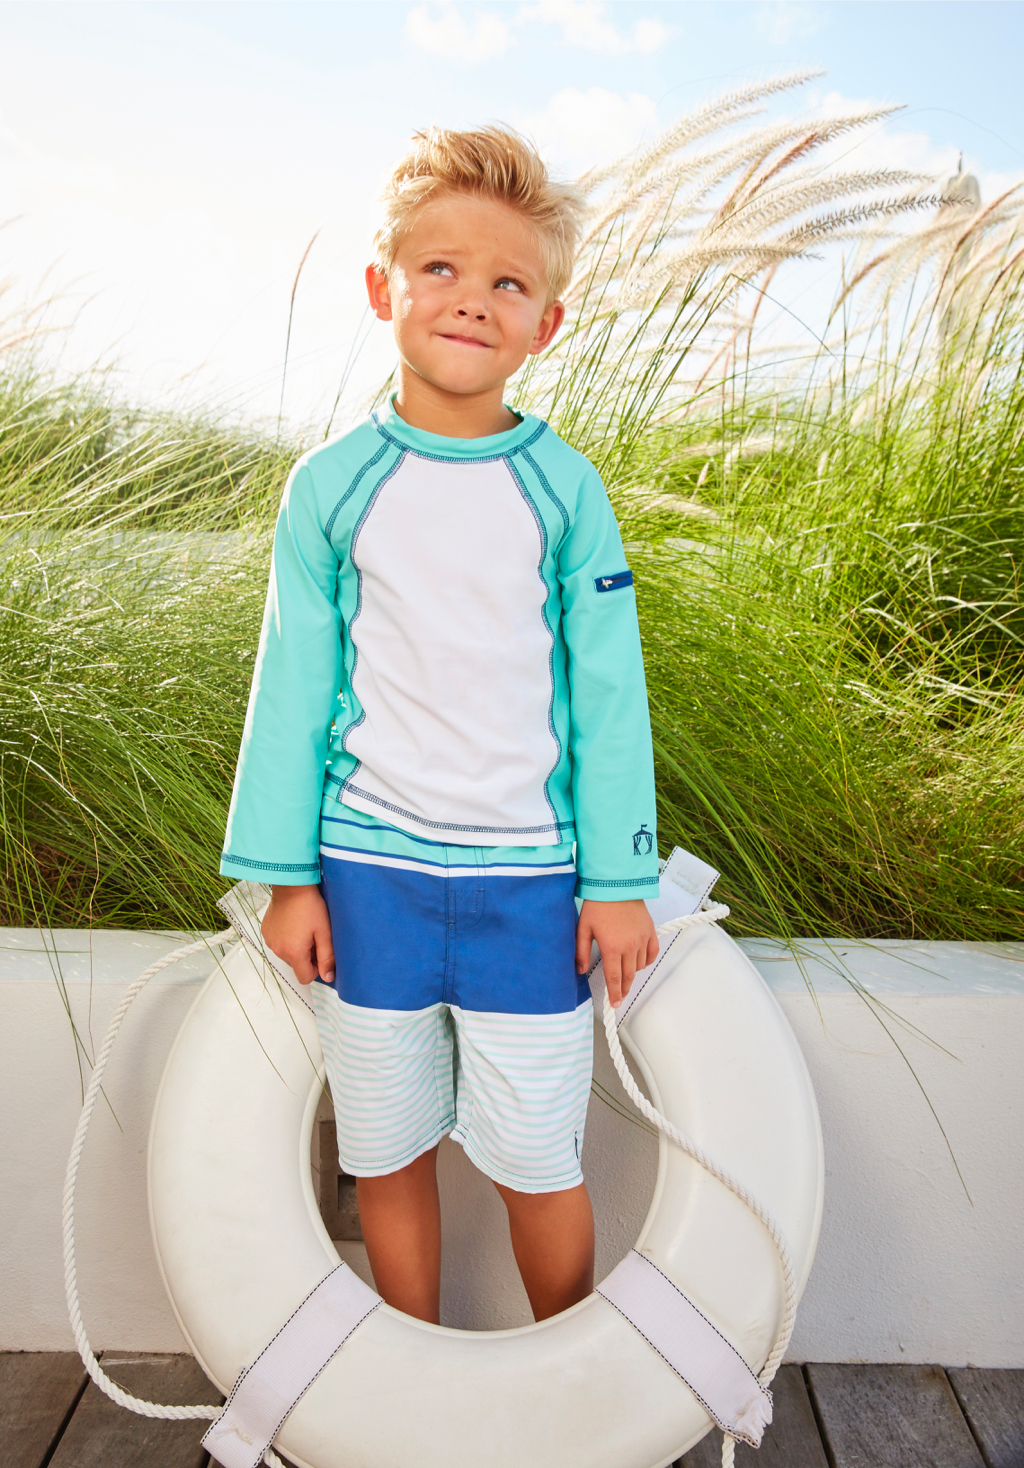 Little-Boys-Rashguard-Sets_Cabana-Life_Nautical-Stripe-Rashguard-Set-1.jpg